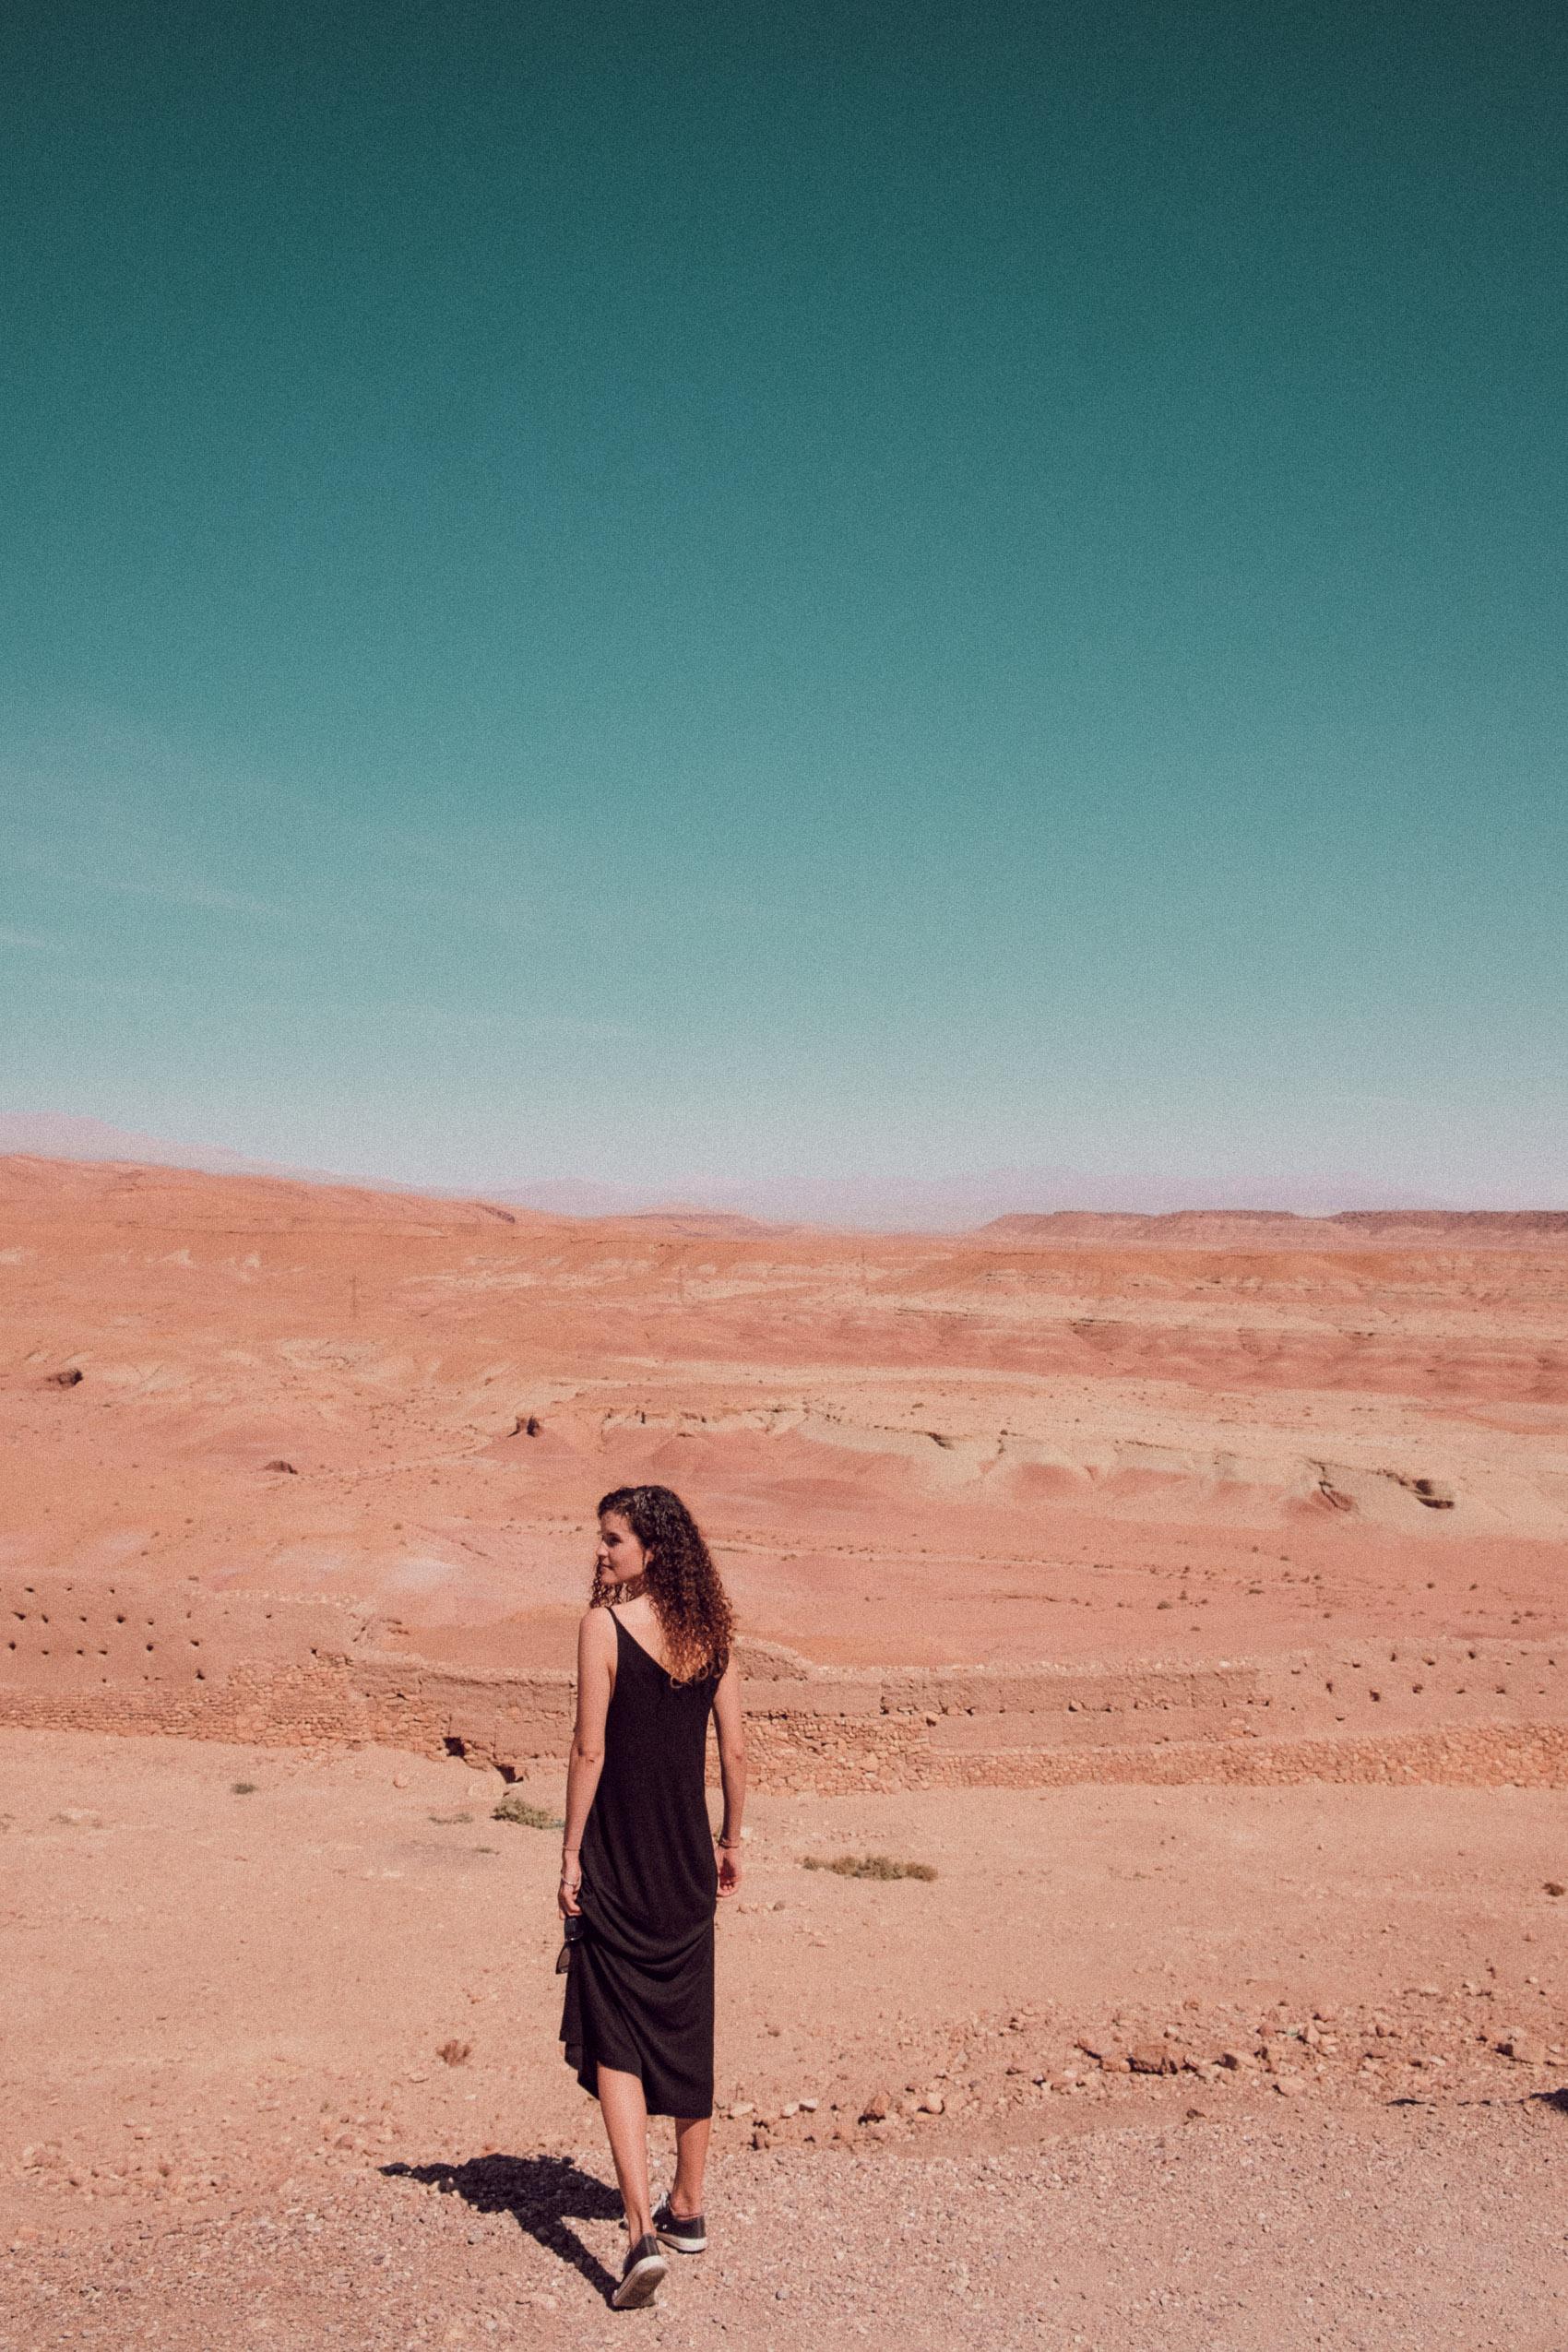 Morocco Our Route & Tips for Marrakech Chefchaouen Essaouira